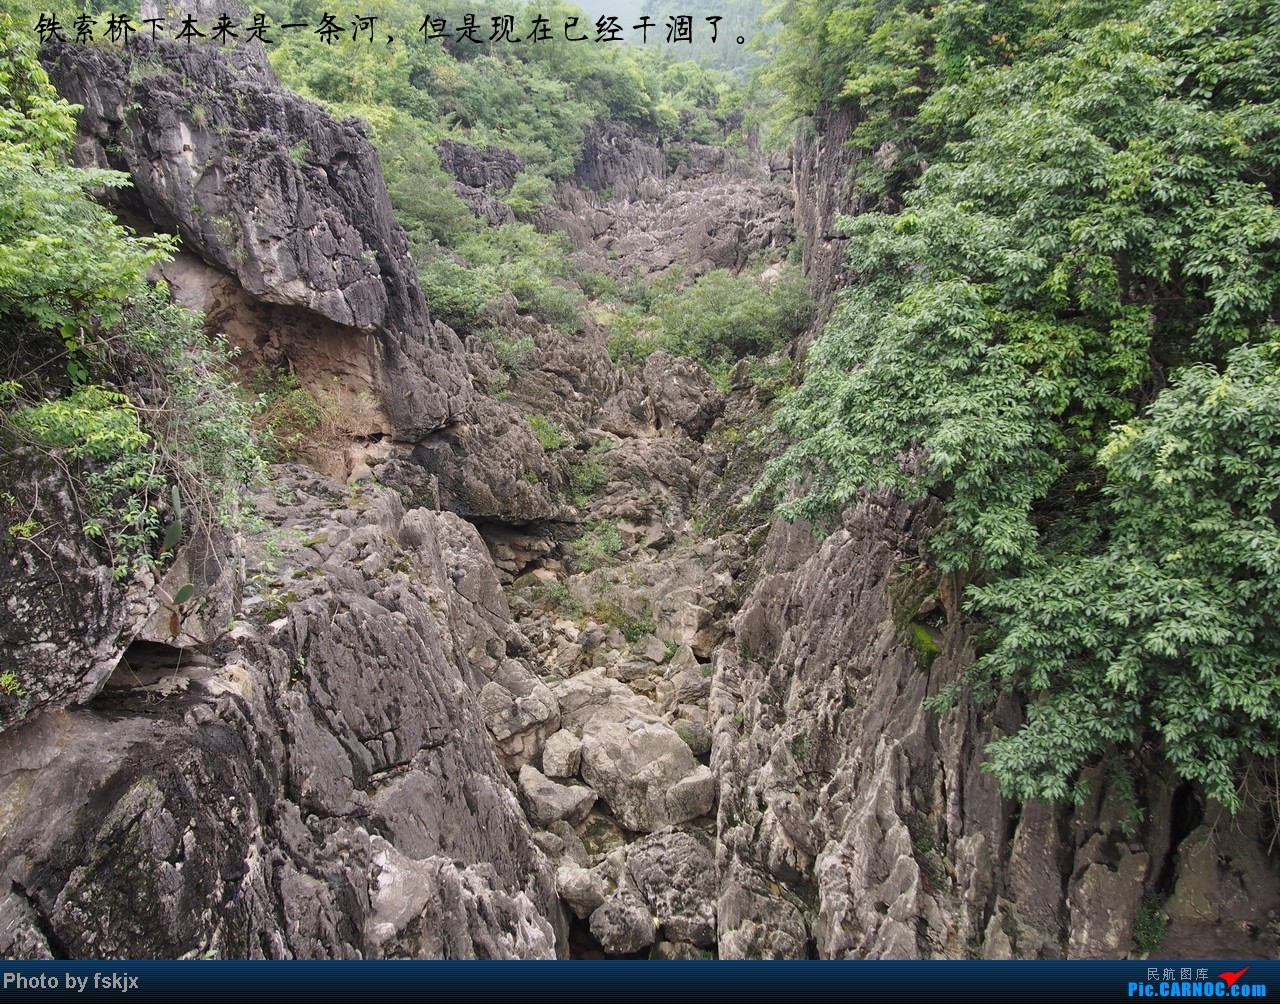 【fskjx的飞行游记☆9】盛夏贵州避暑,感受壮观的黄果树瀑布